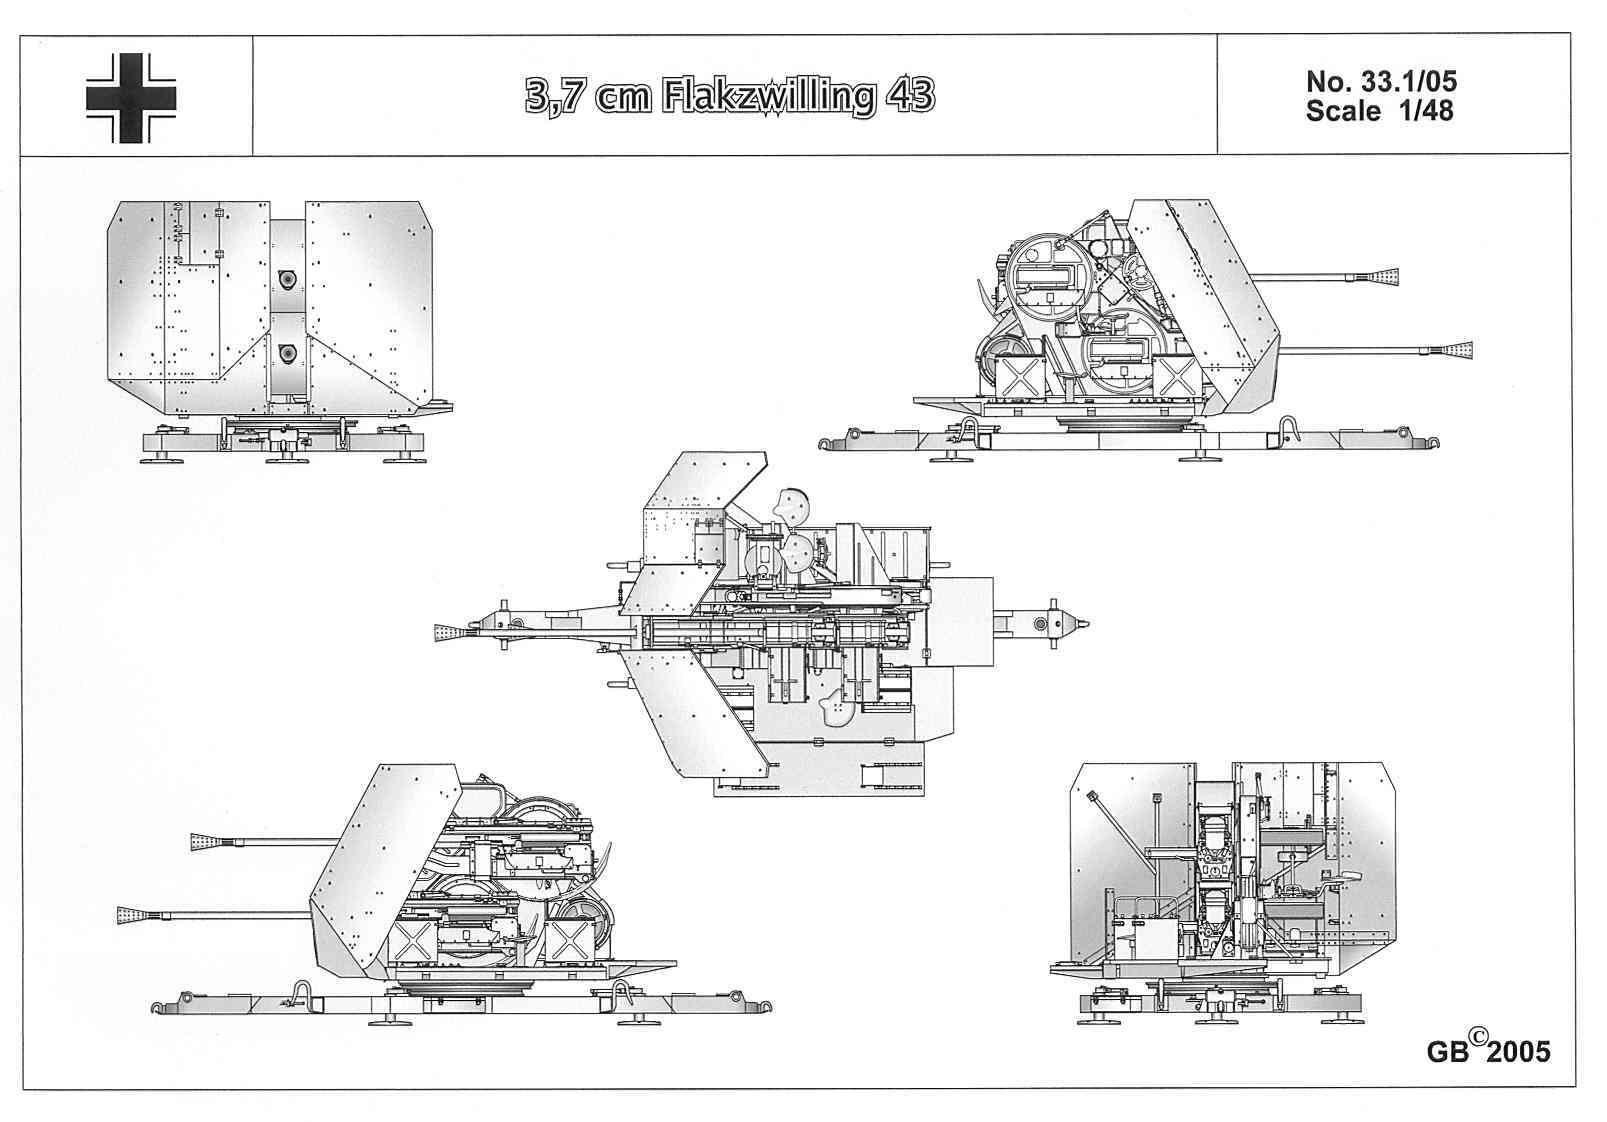 3 7 Cm Flakzwilling 43